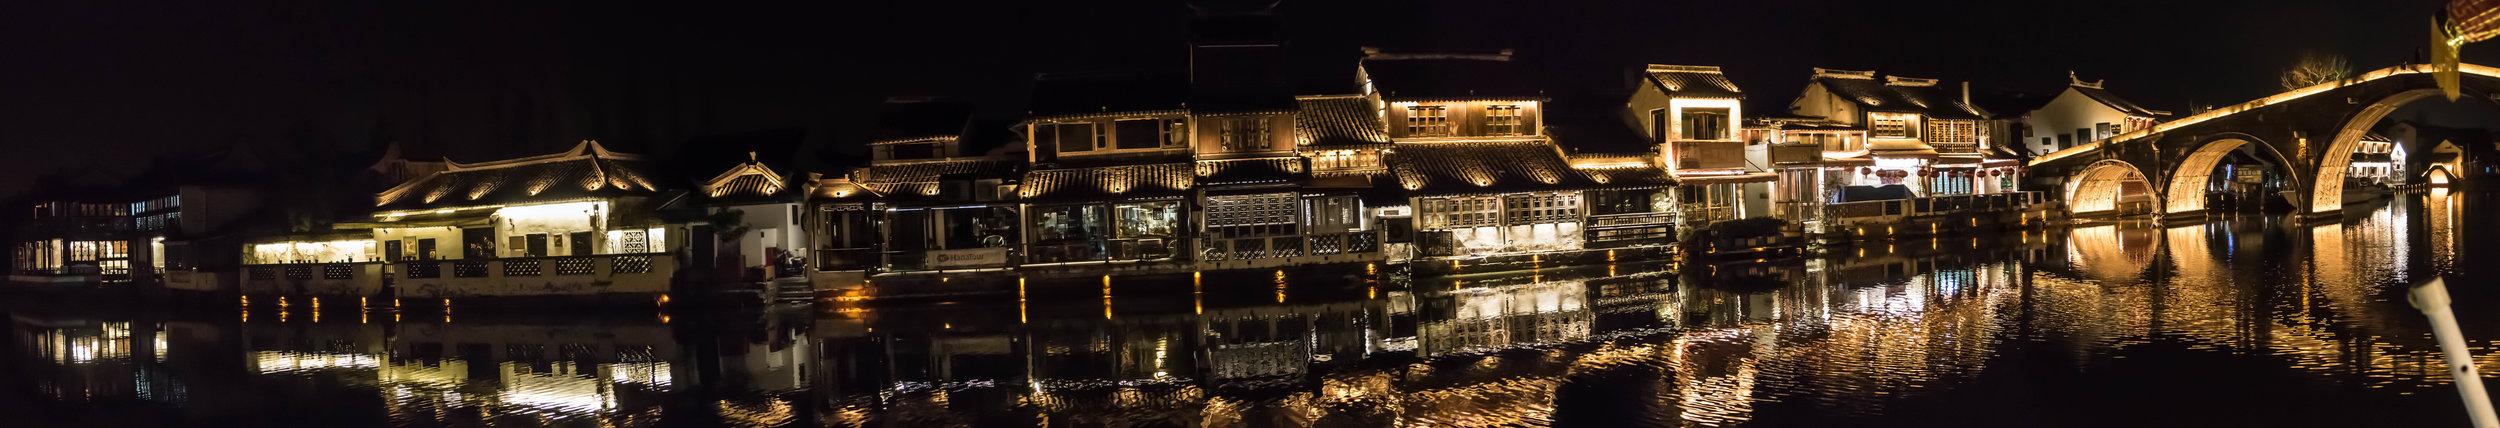 Night scene on the river